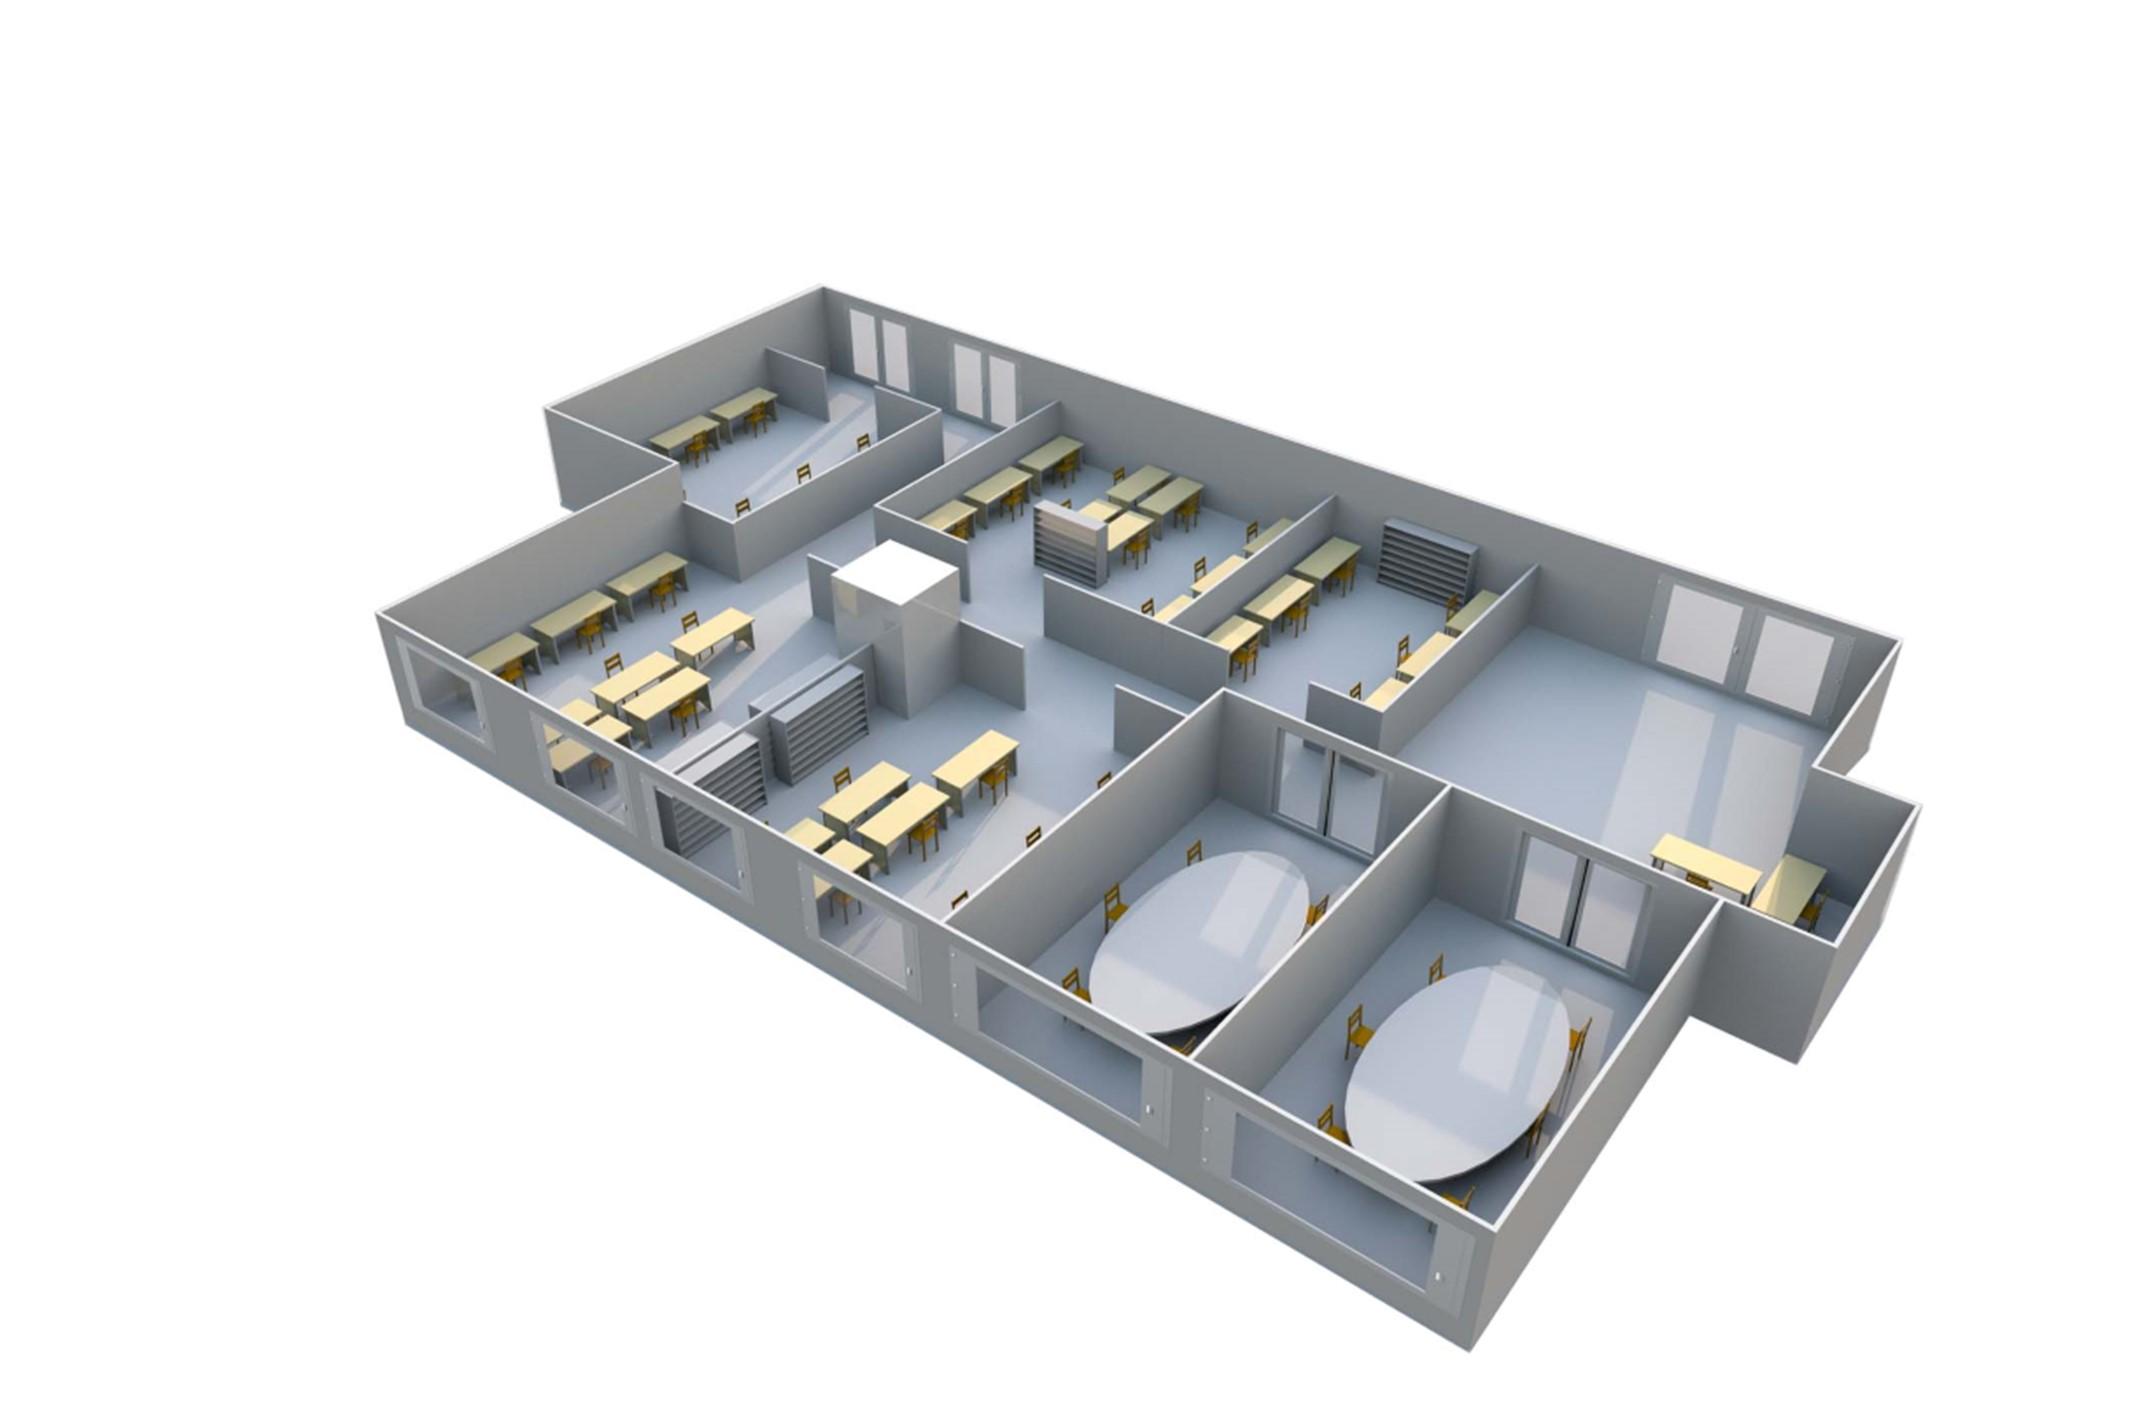 MVHR floorplan